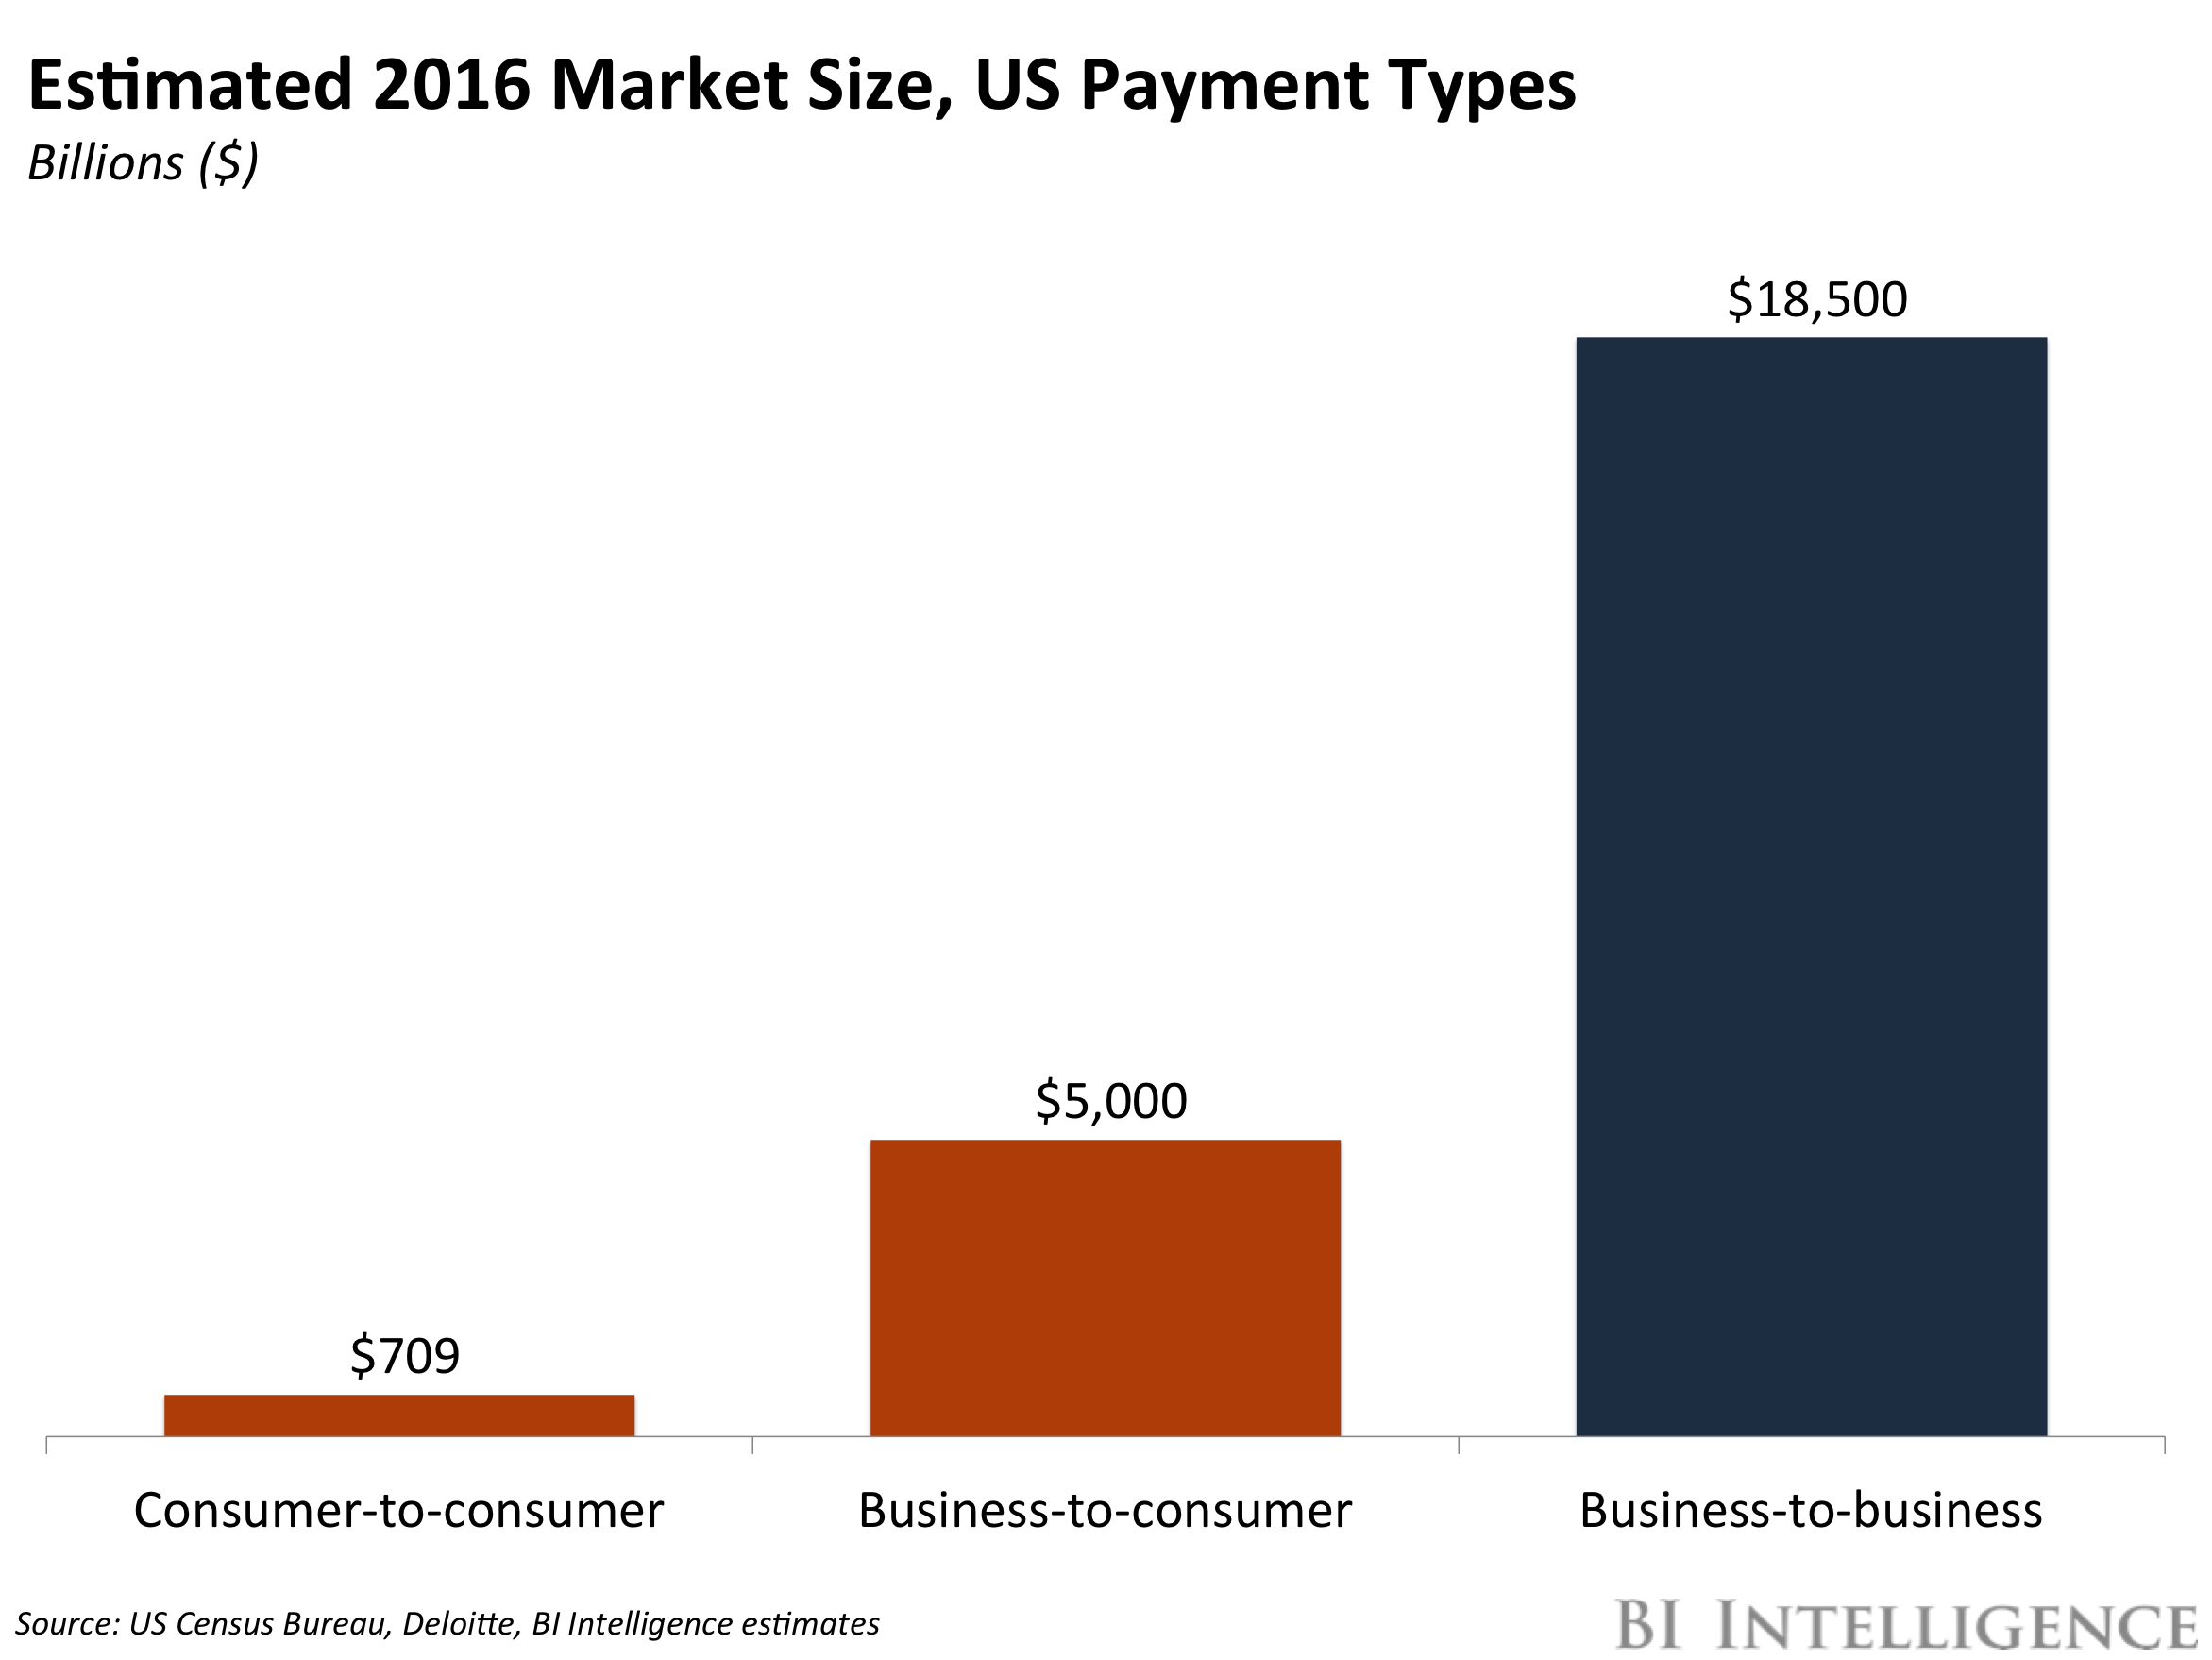 B2B Market Size